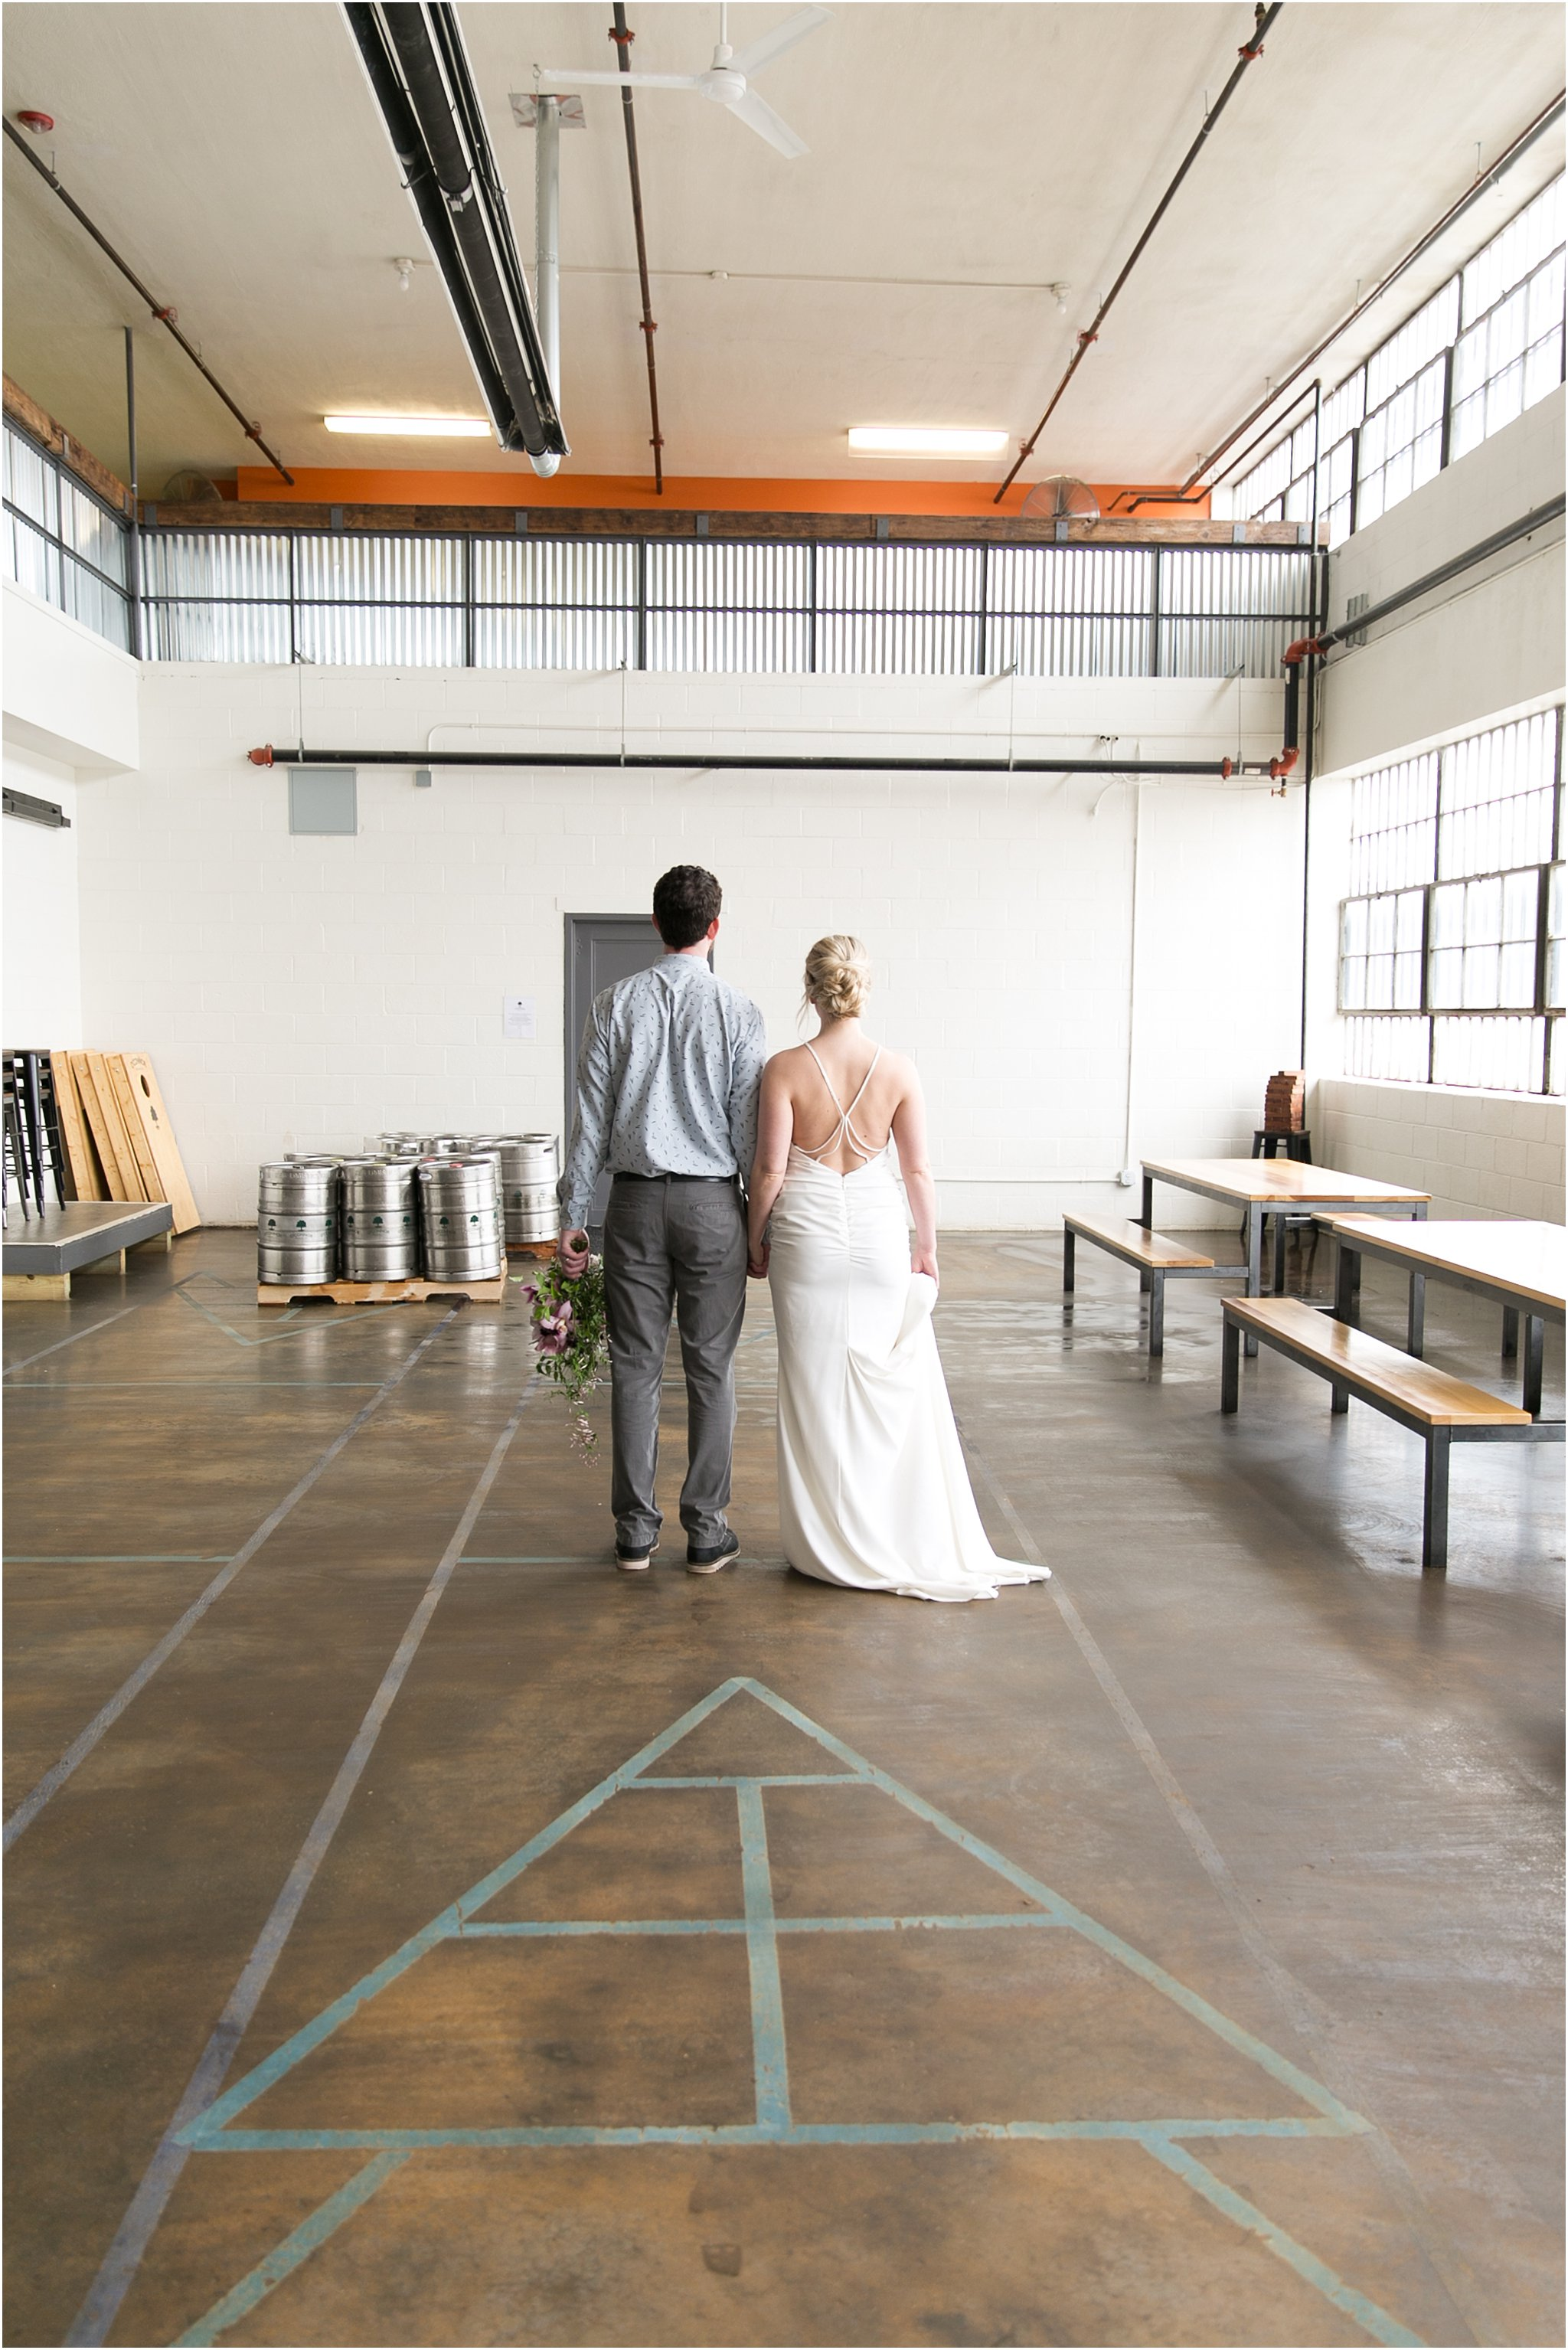 jessica_ryan_photography_oconnor_brewing_wedding_oconnor_brewing_co_norfolk_virginia_roost_flowers_blue_birds_garage__0798